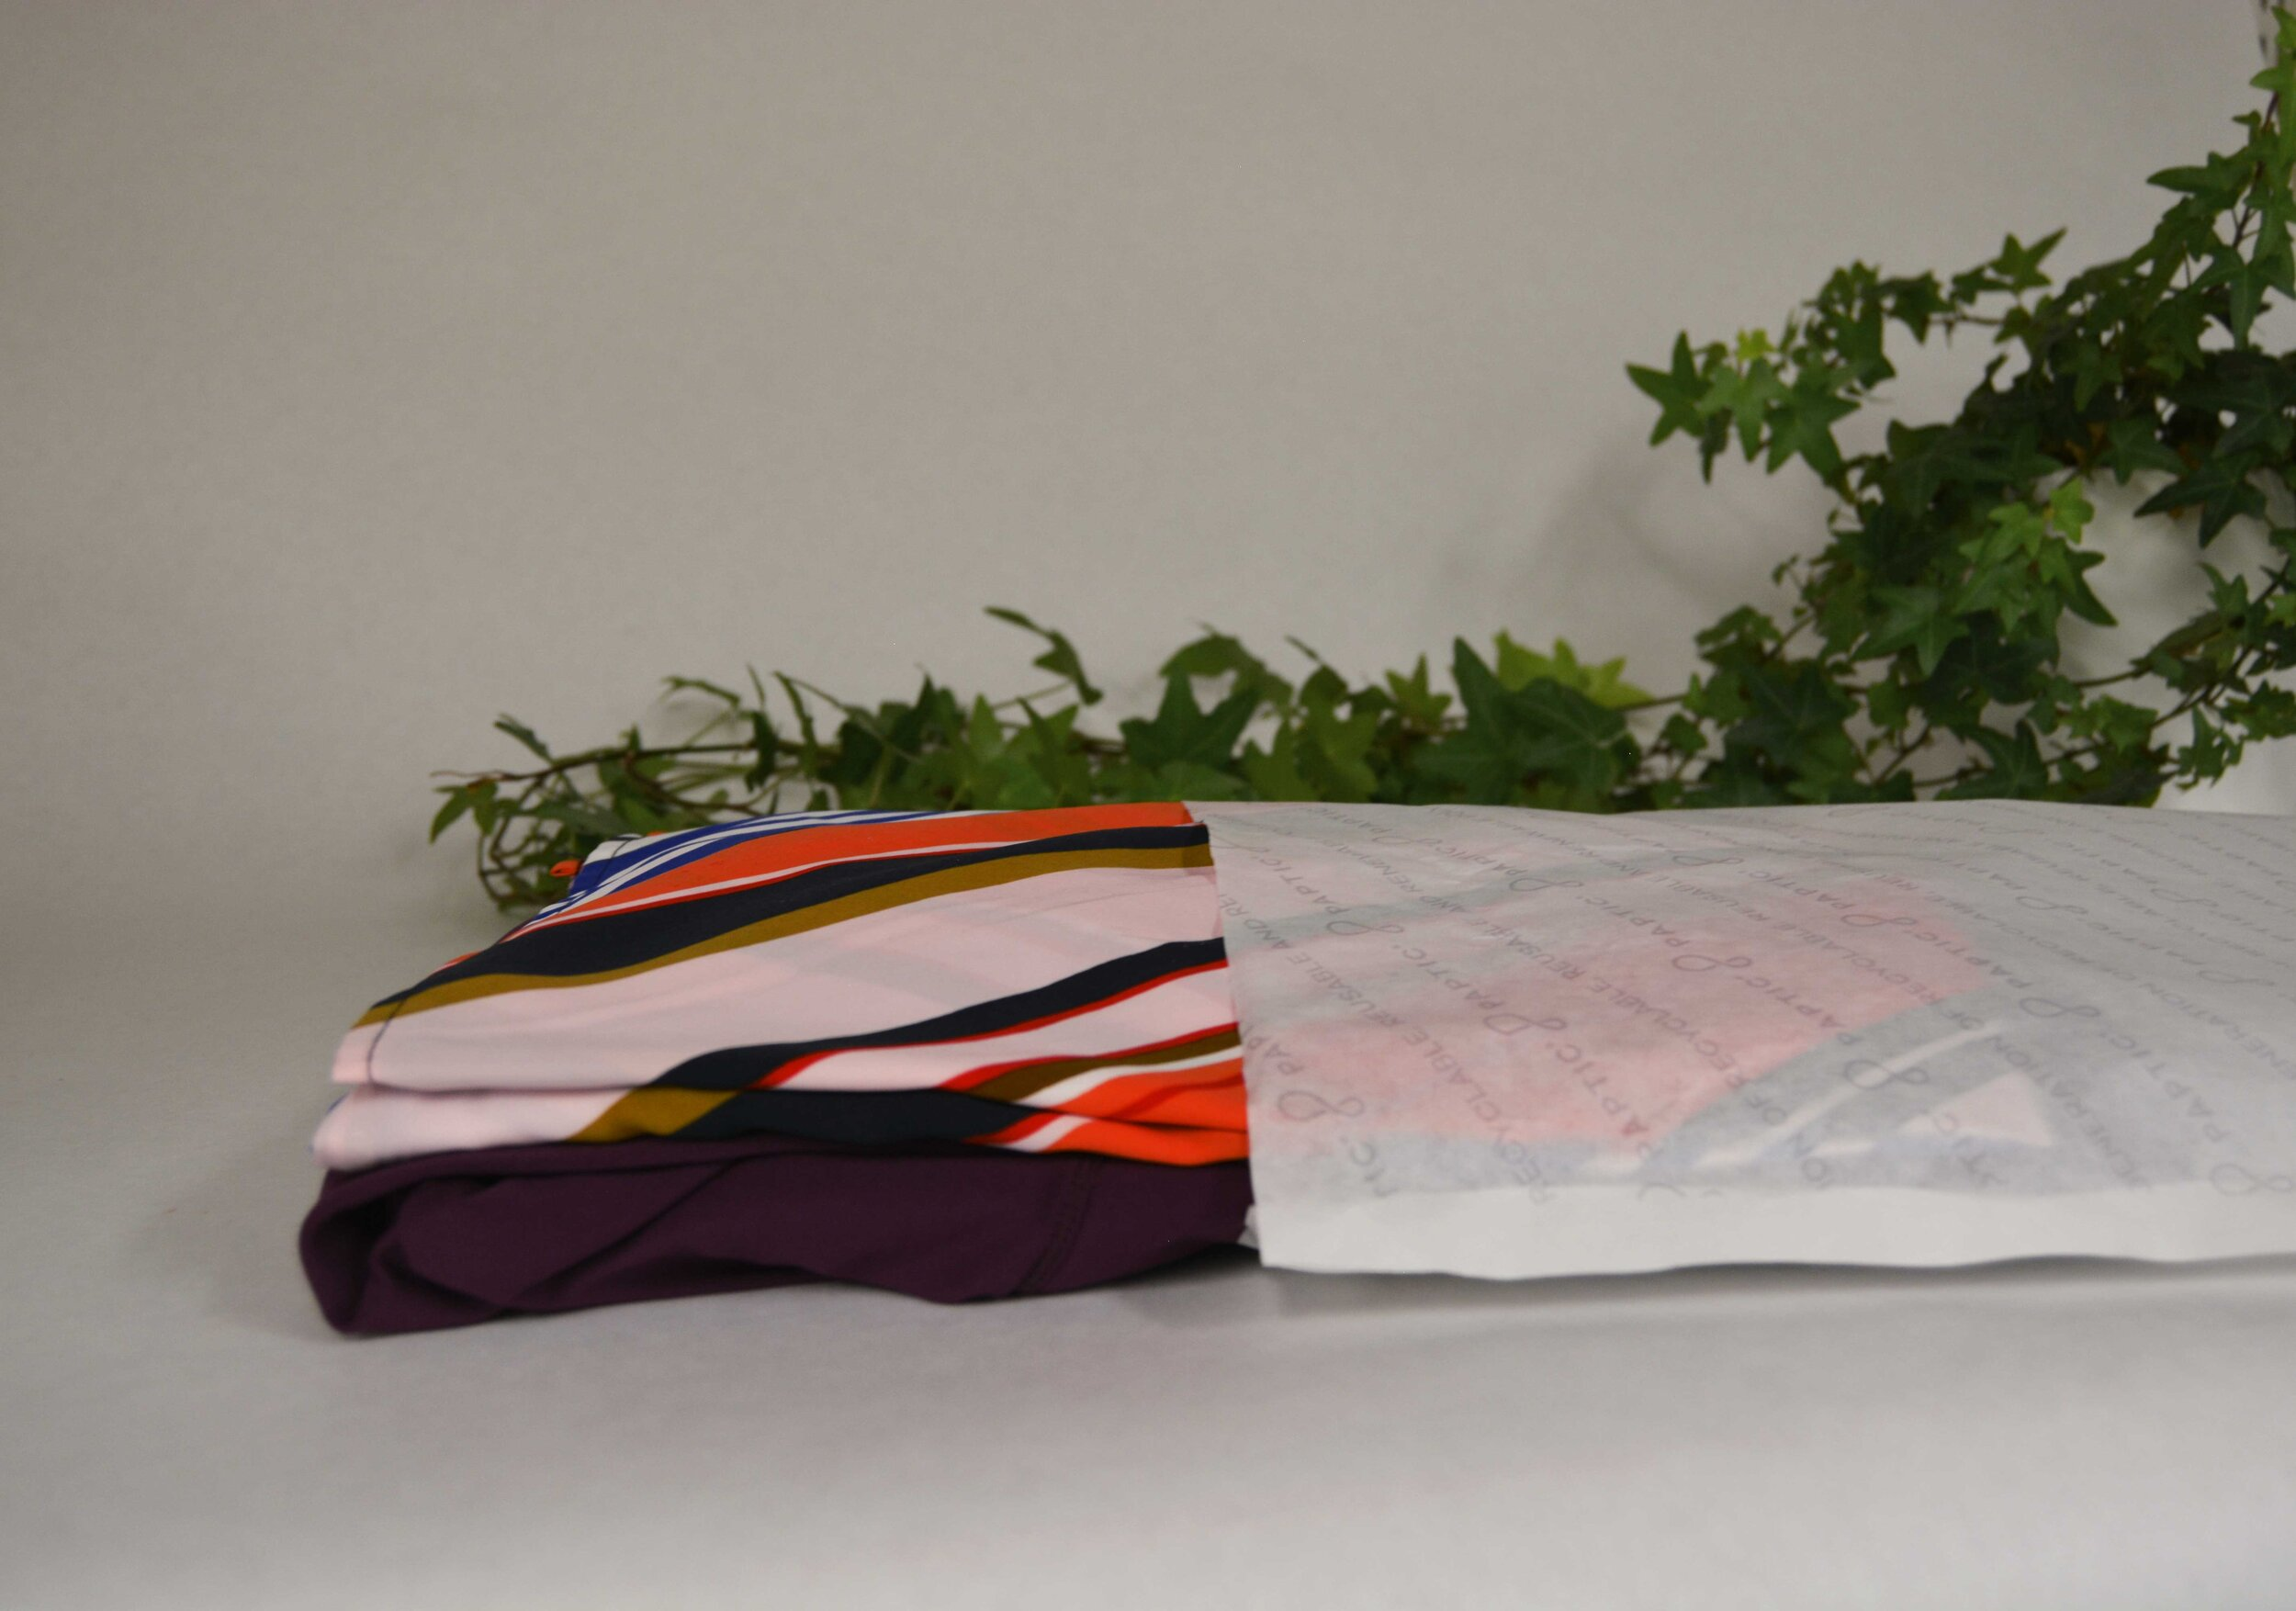 HighPeak - HighPeak Finland Oy是北欧商业礼品和促销产品市场的领导公司之一。高峰也是国际工资集团的一部分,是一家专业从事广告产品的公司网络。必威app精装版苹果版betway必威安卓Paptic®Gavia袋取代了服装厂(即High Peak供应商)的塑料塑料袋来包装t恤。再也没有掉下来的t恤堆了!当High Peak决定用Paptic®袋代替传统的塑料塑料袋包装WRC商品时,可持续的努力是驱动力。betway必威安卓必威app精装版苹果版随着质量和可持续性体验的提高,消费者,Paptic®包装t恤保持良好成堆缓解销售工作在活动。betway必威安卓必威app精装版苹果版以纤维为基础,可回收的Paptic®材料取代塑料包装已经得到了各品牌的赞赏。betway必威安卓必威app精装版苹果版HighPeak致力于为传统业务提供新的优势。在销售点的易于处理是在该领域的积极体验。